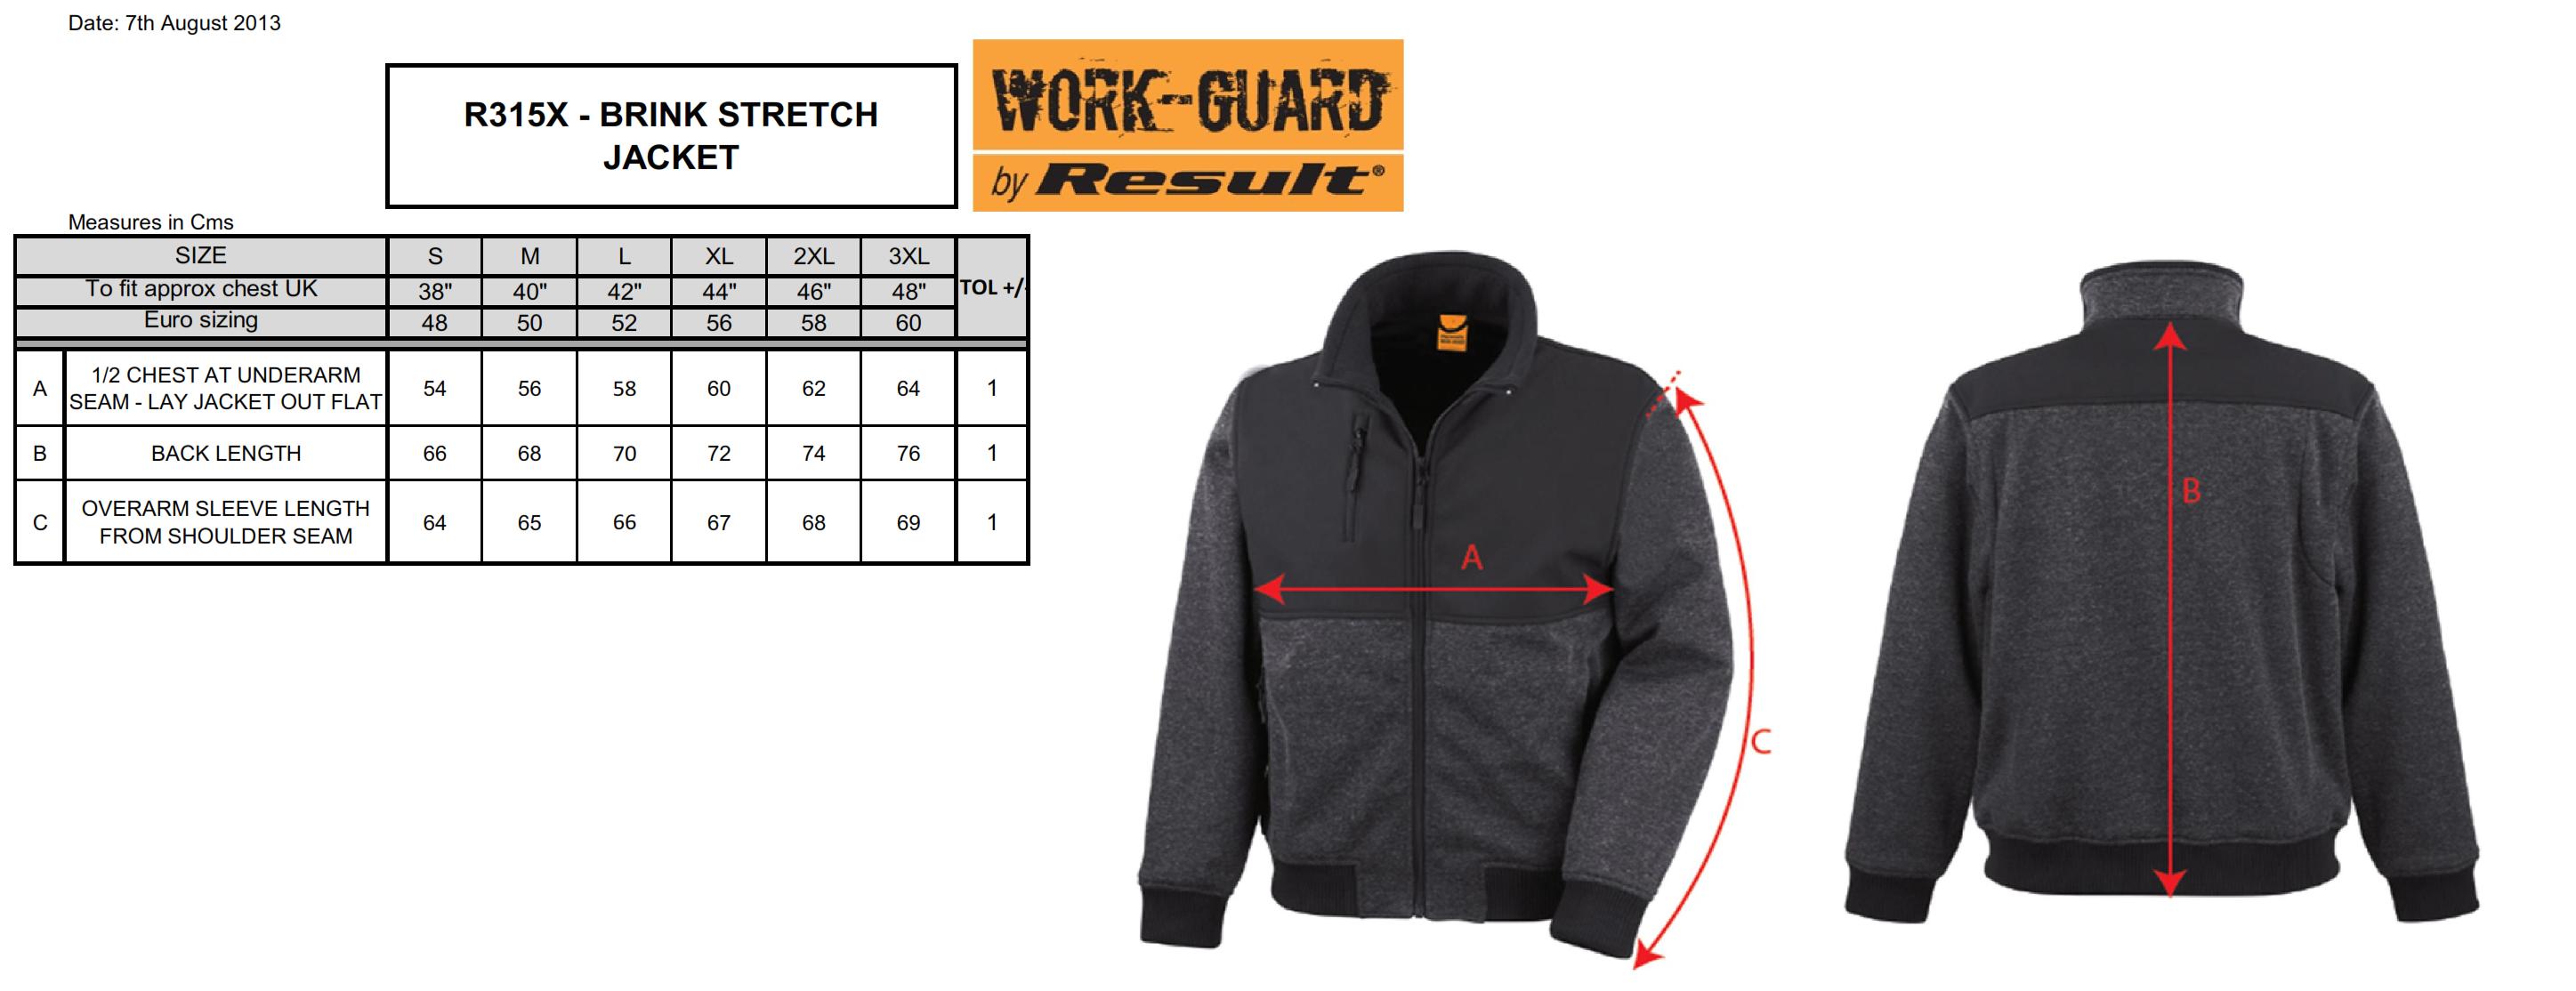 Result: Work-Guard Brink Stretch Jacket R315X